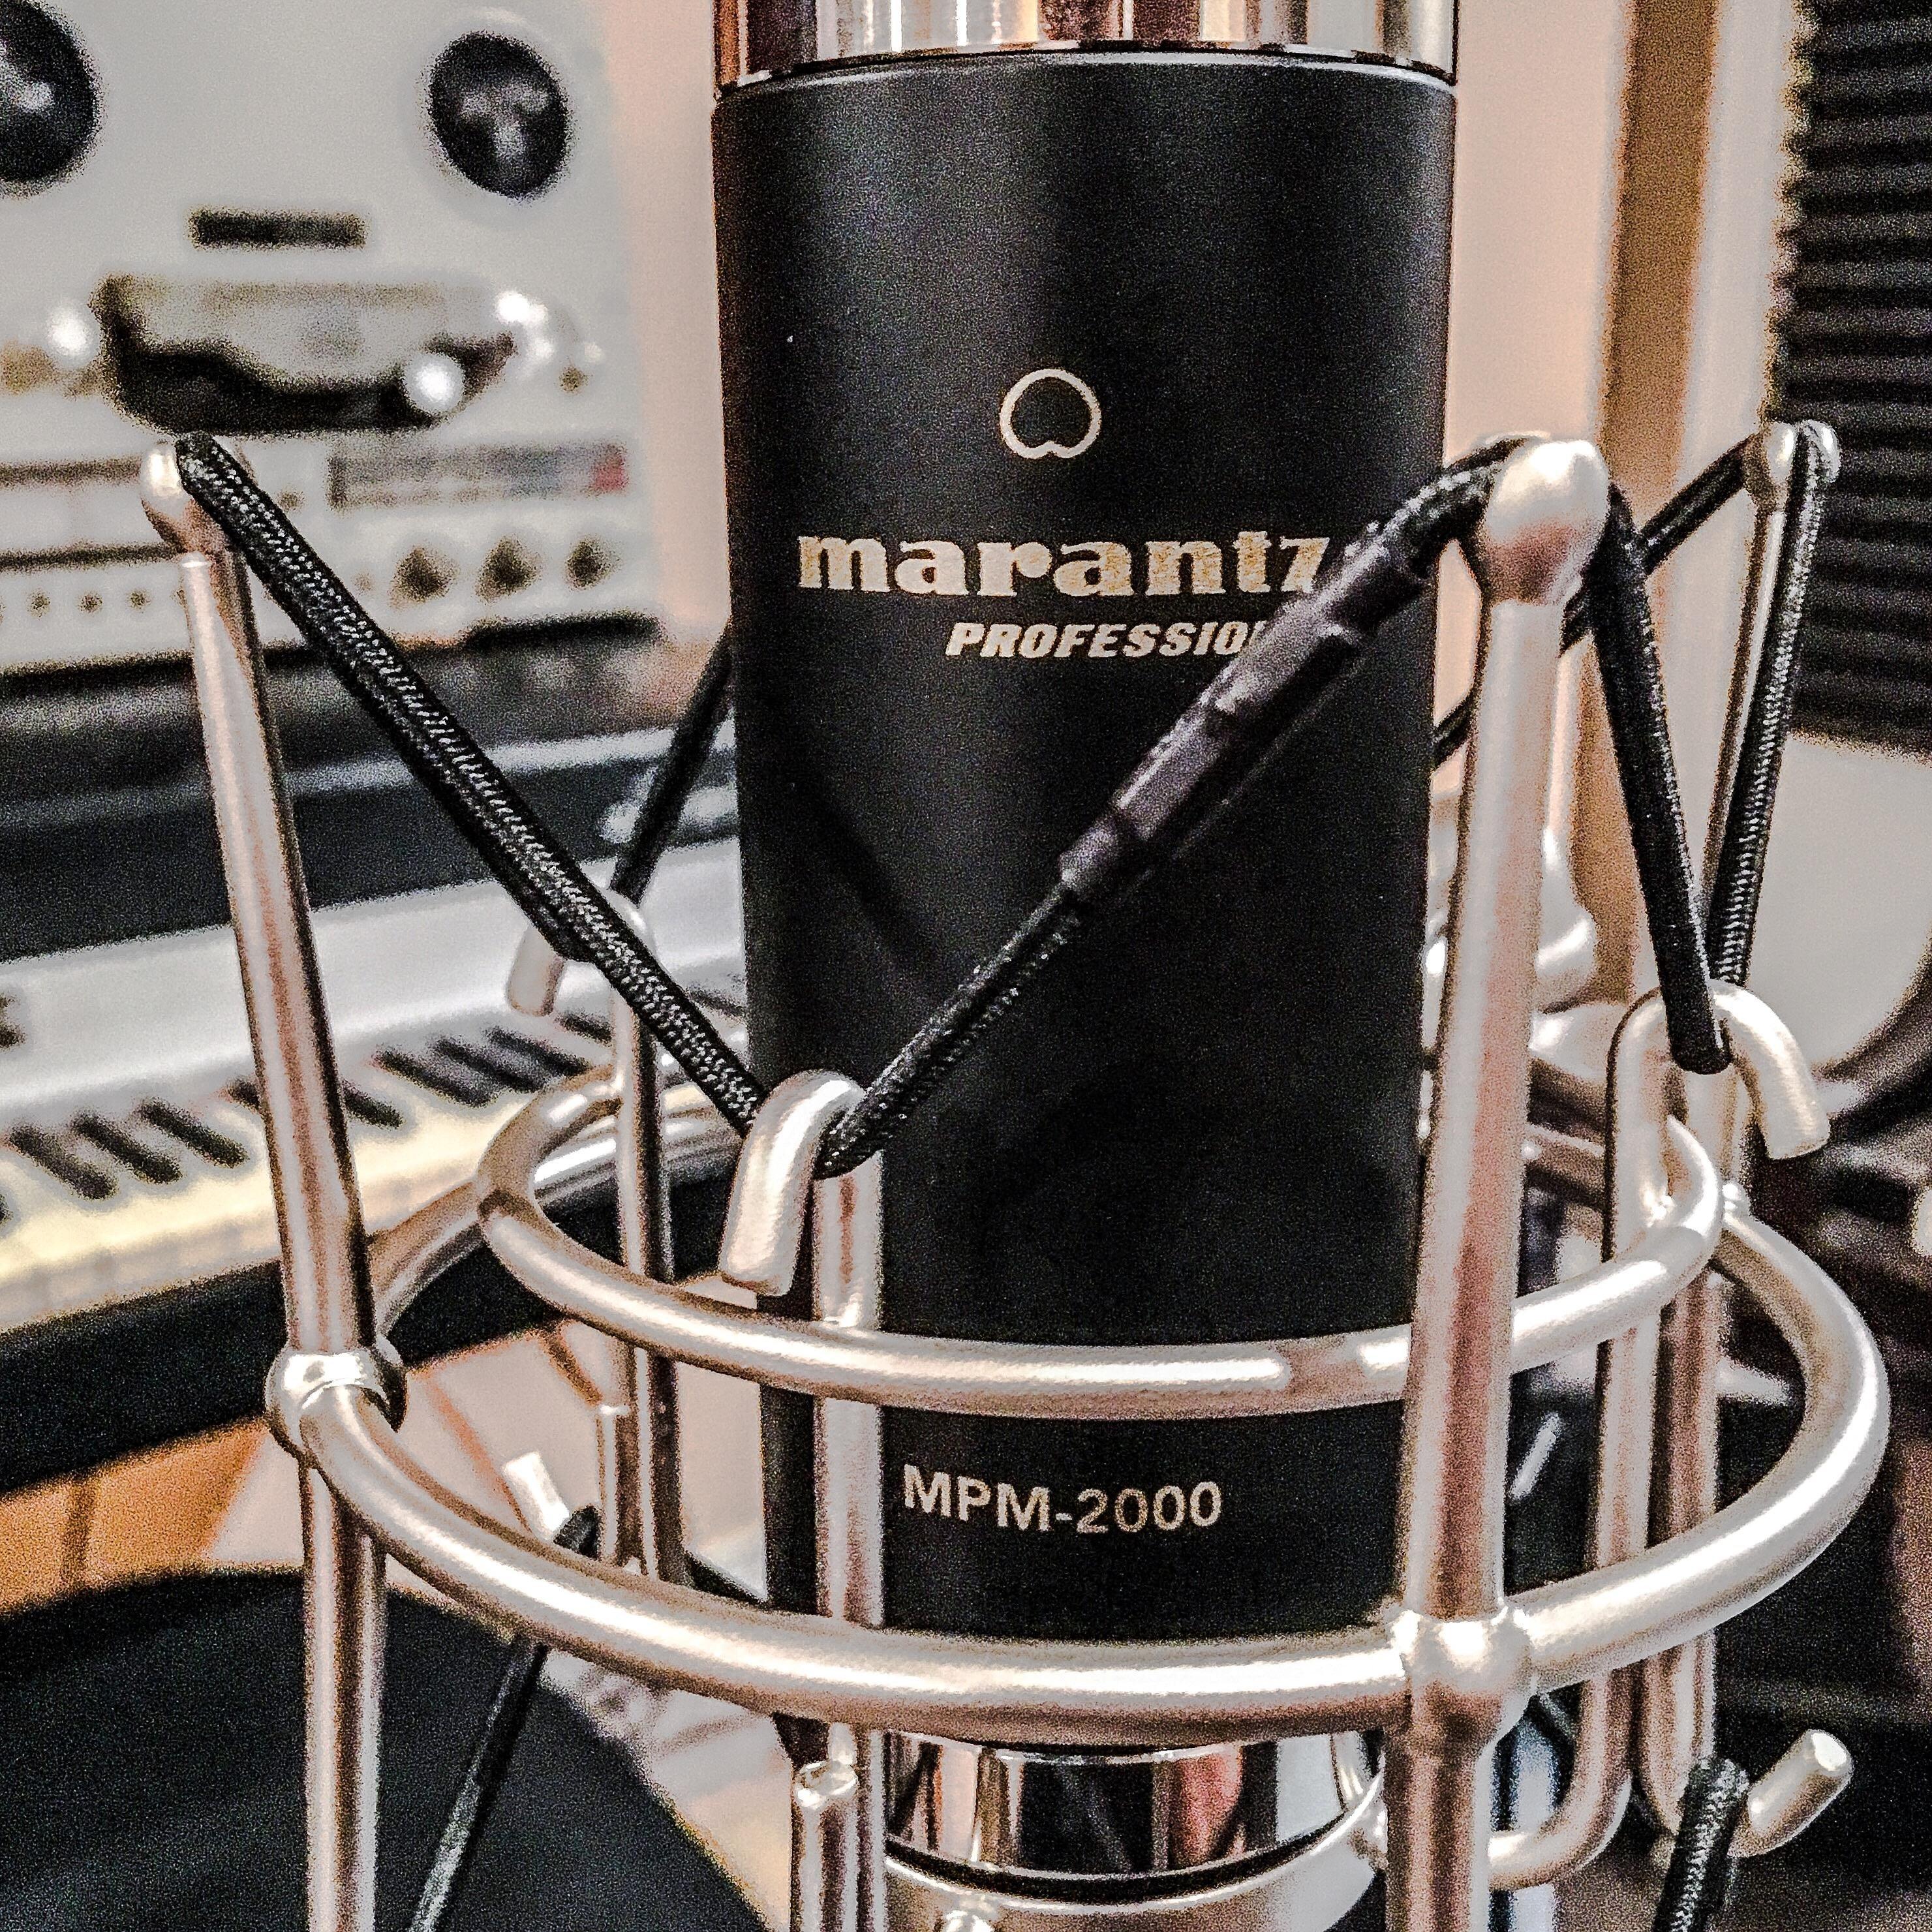 Marantz MPM-2000